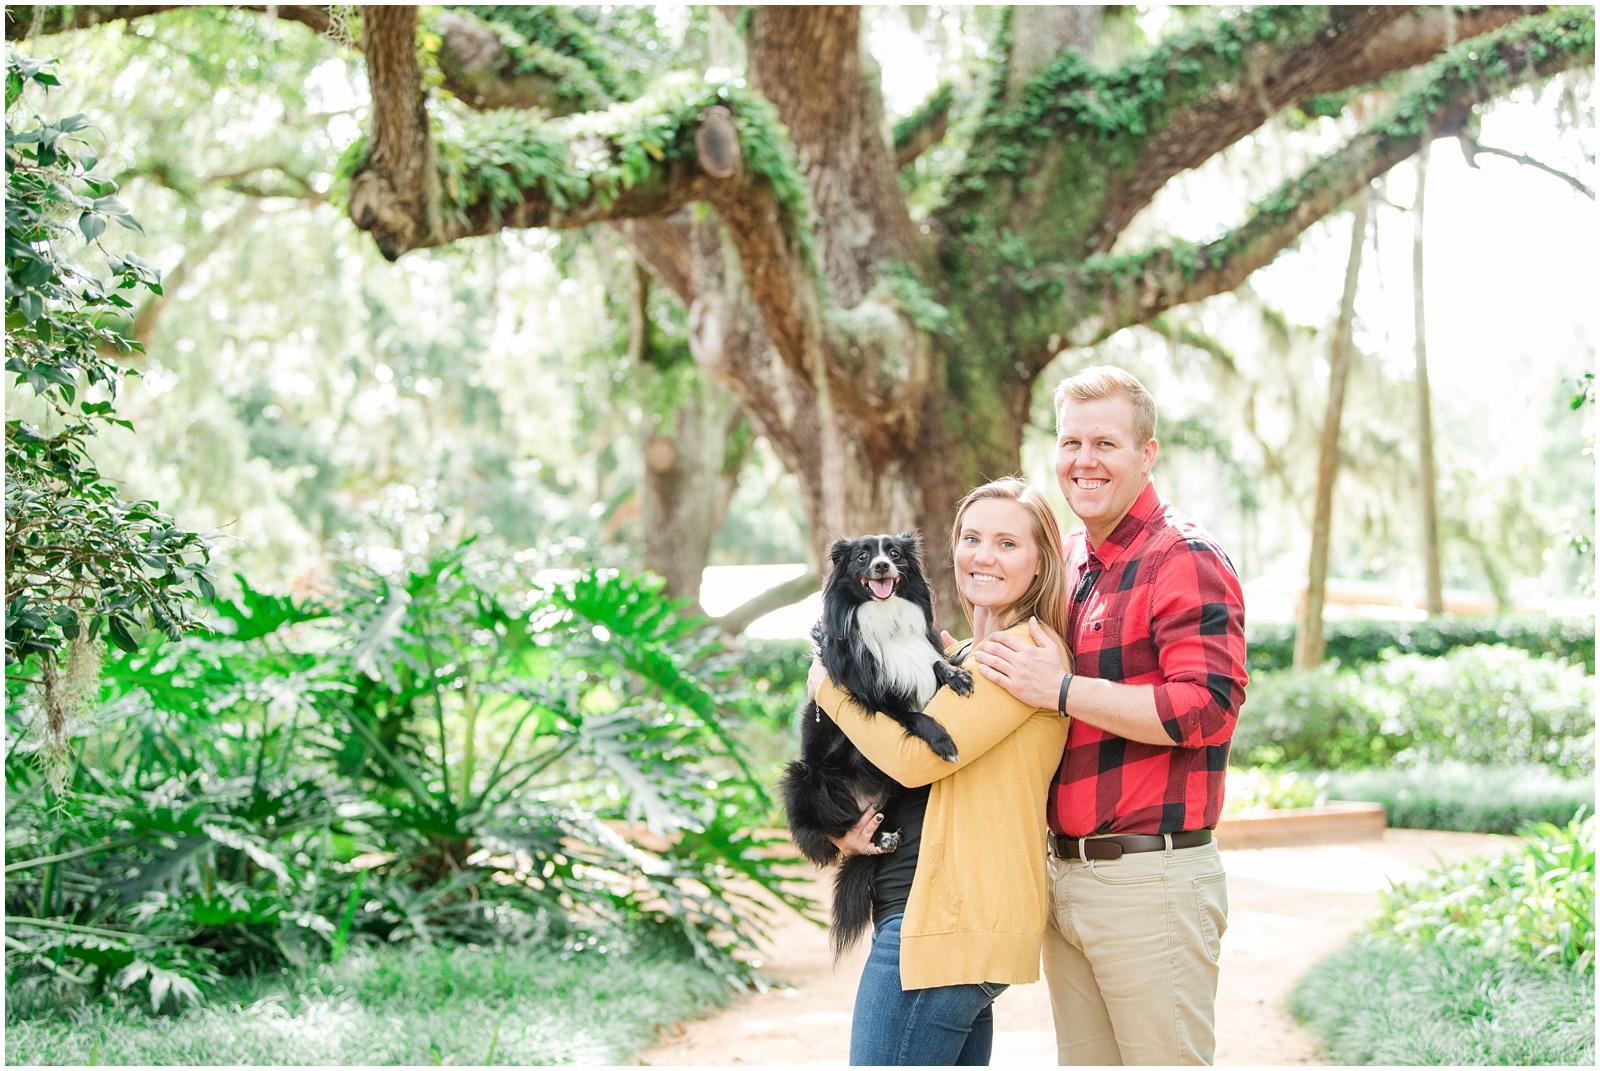 Palm Coast_Washington Oaks Garden_State Park_Engagement_Portraits_34.jpg